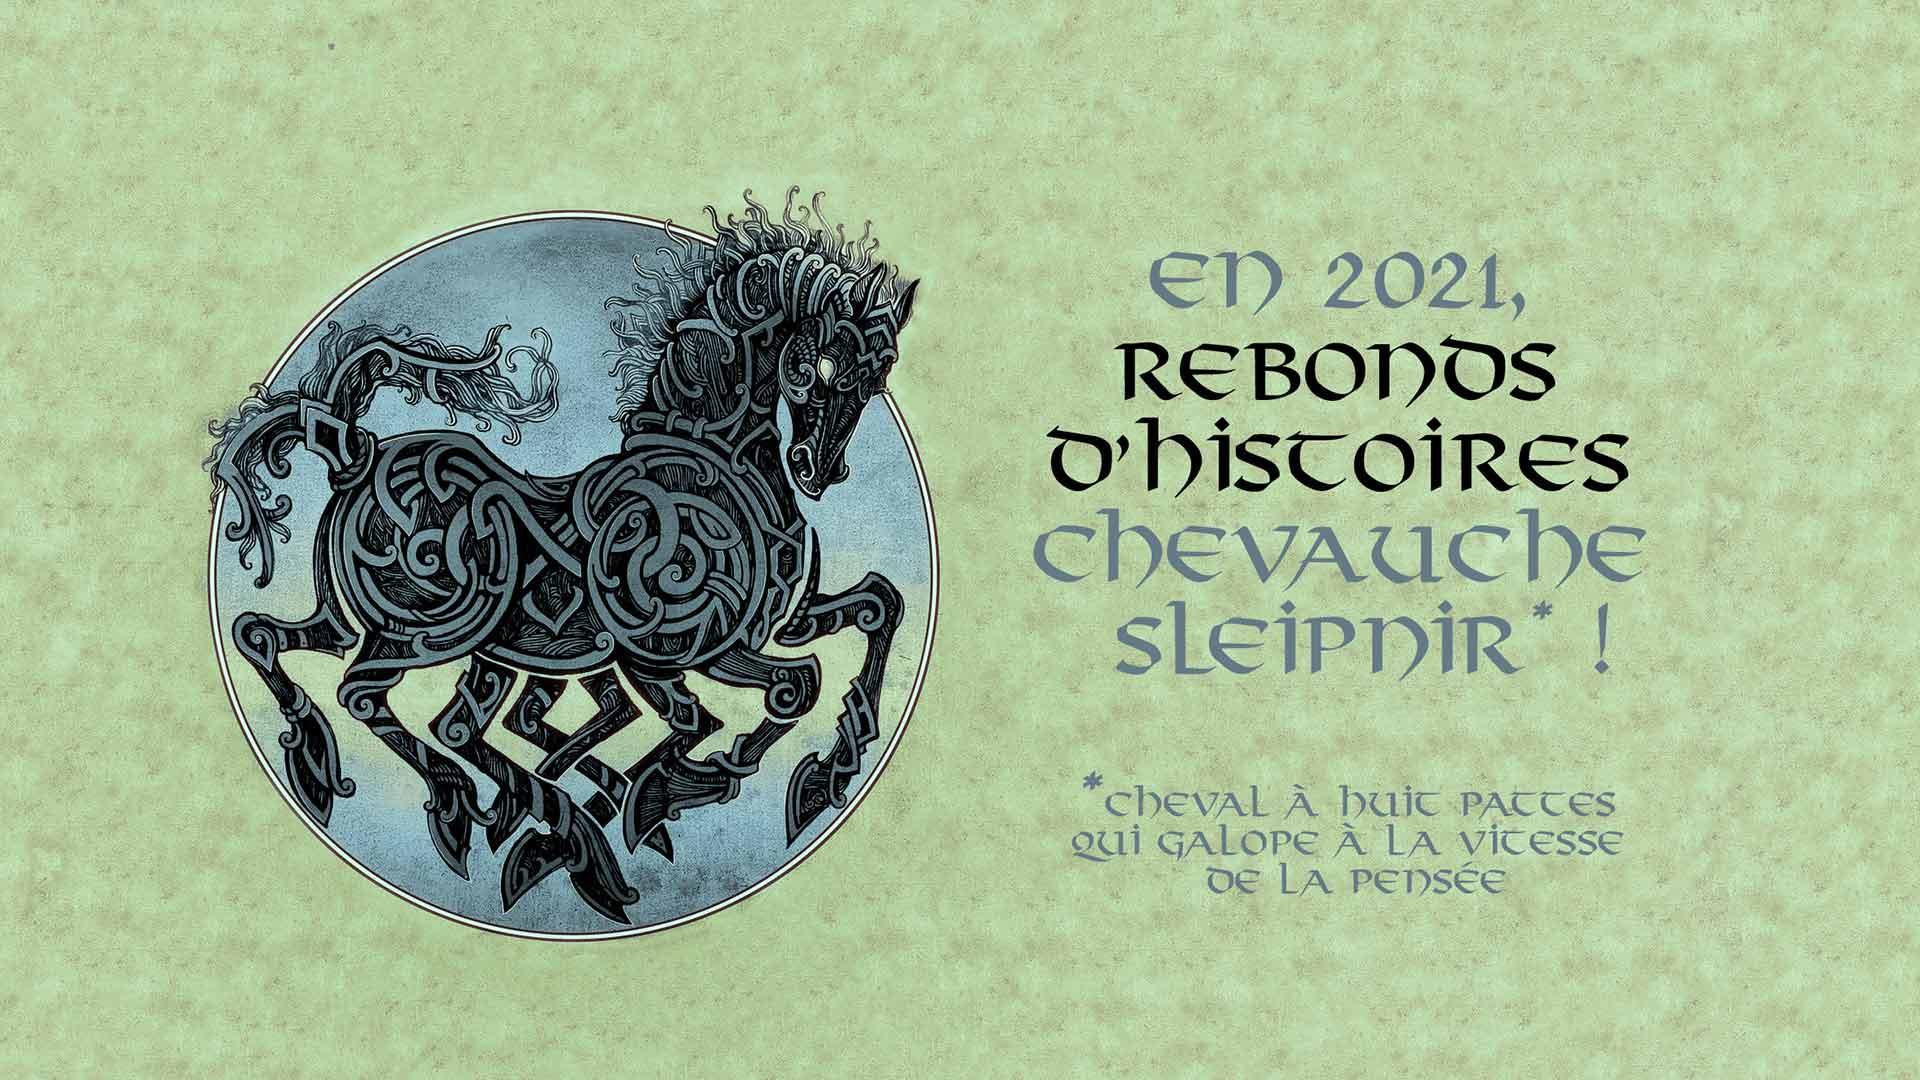 En 2021, Rebonds d'histoires chevauche Sleipnir !